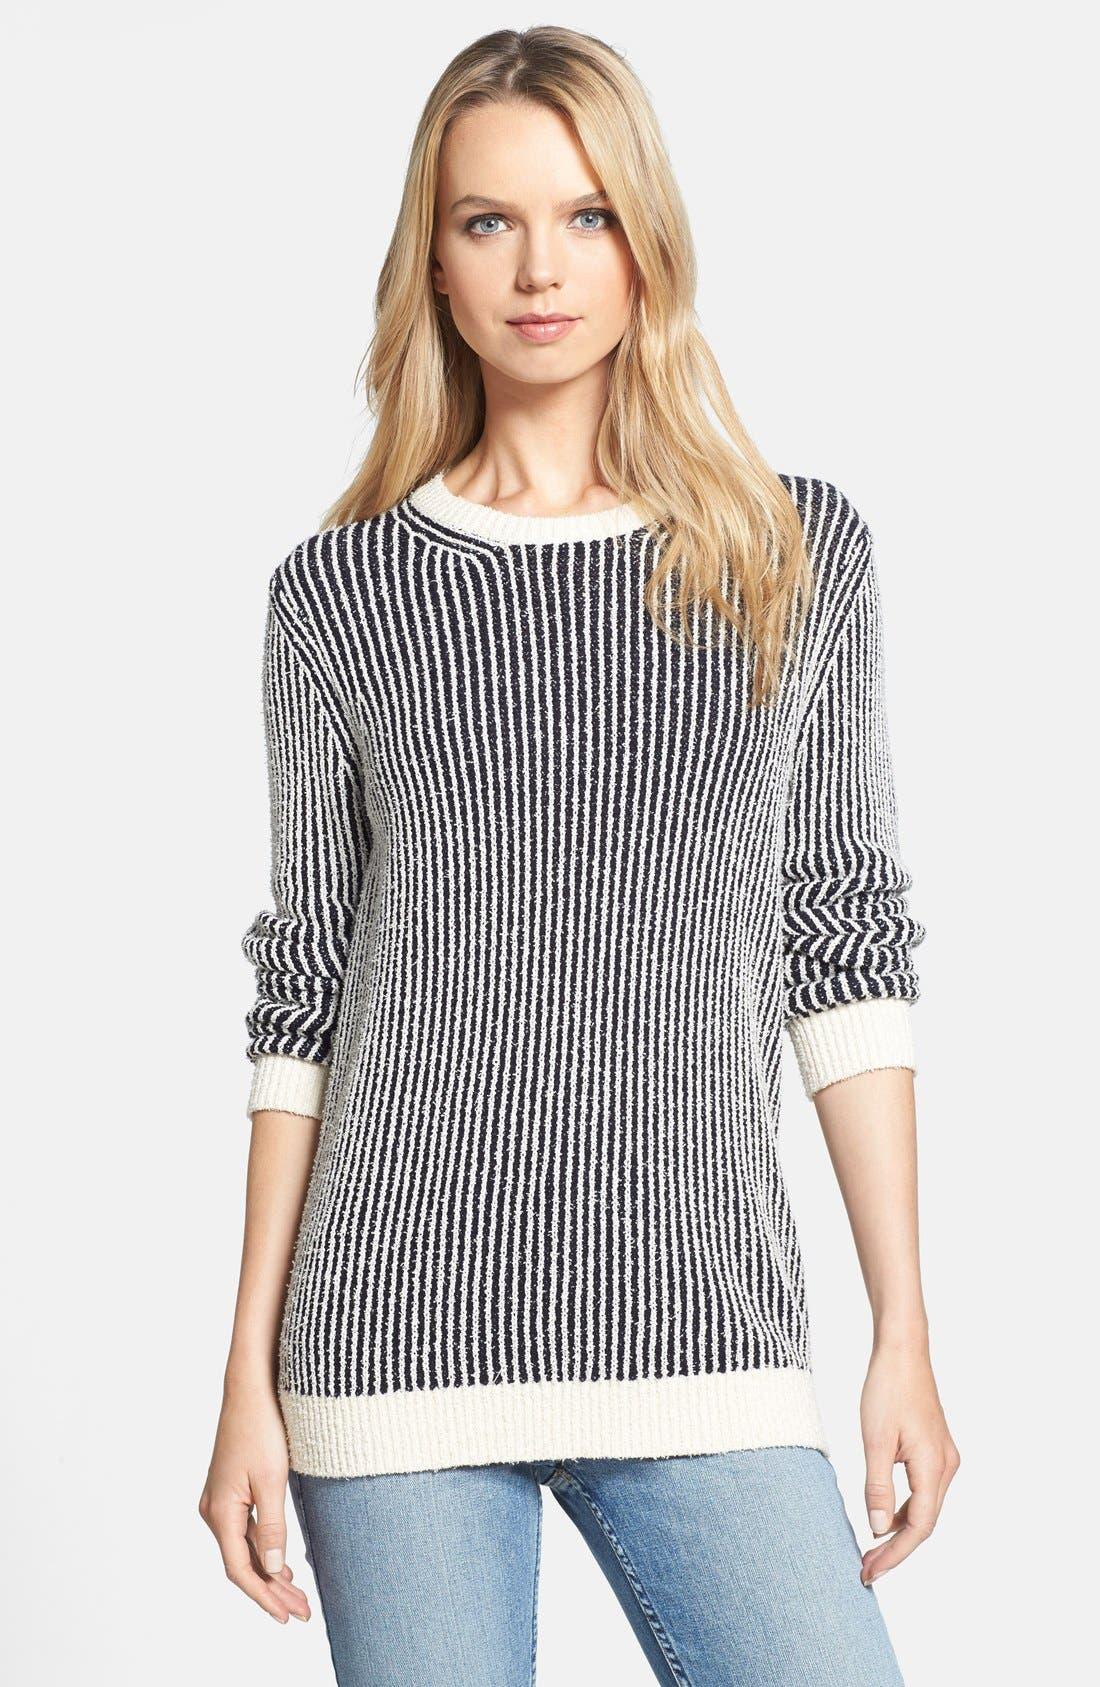 Main Image - Theory 'Jaidyn SN' Textured Stripe Sweater